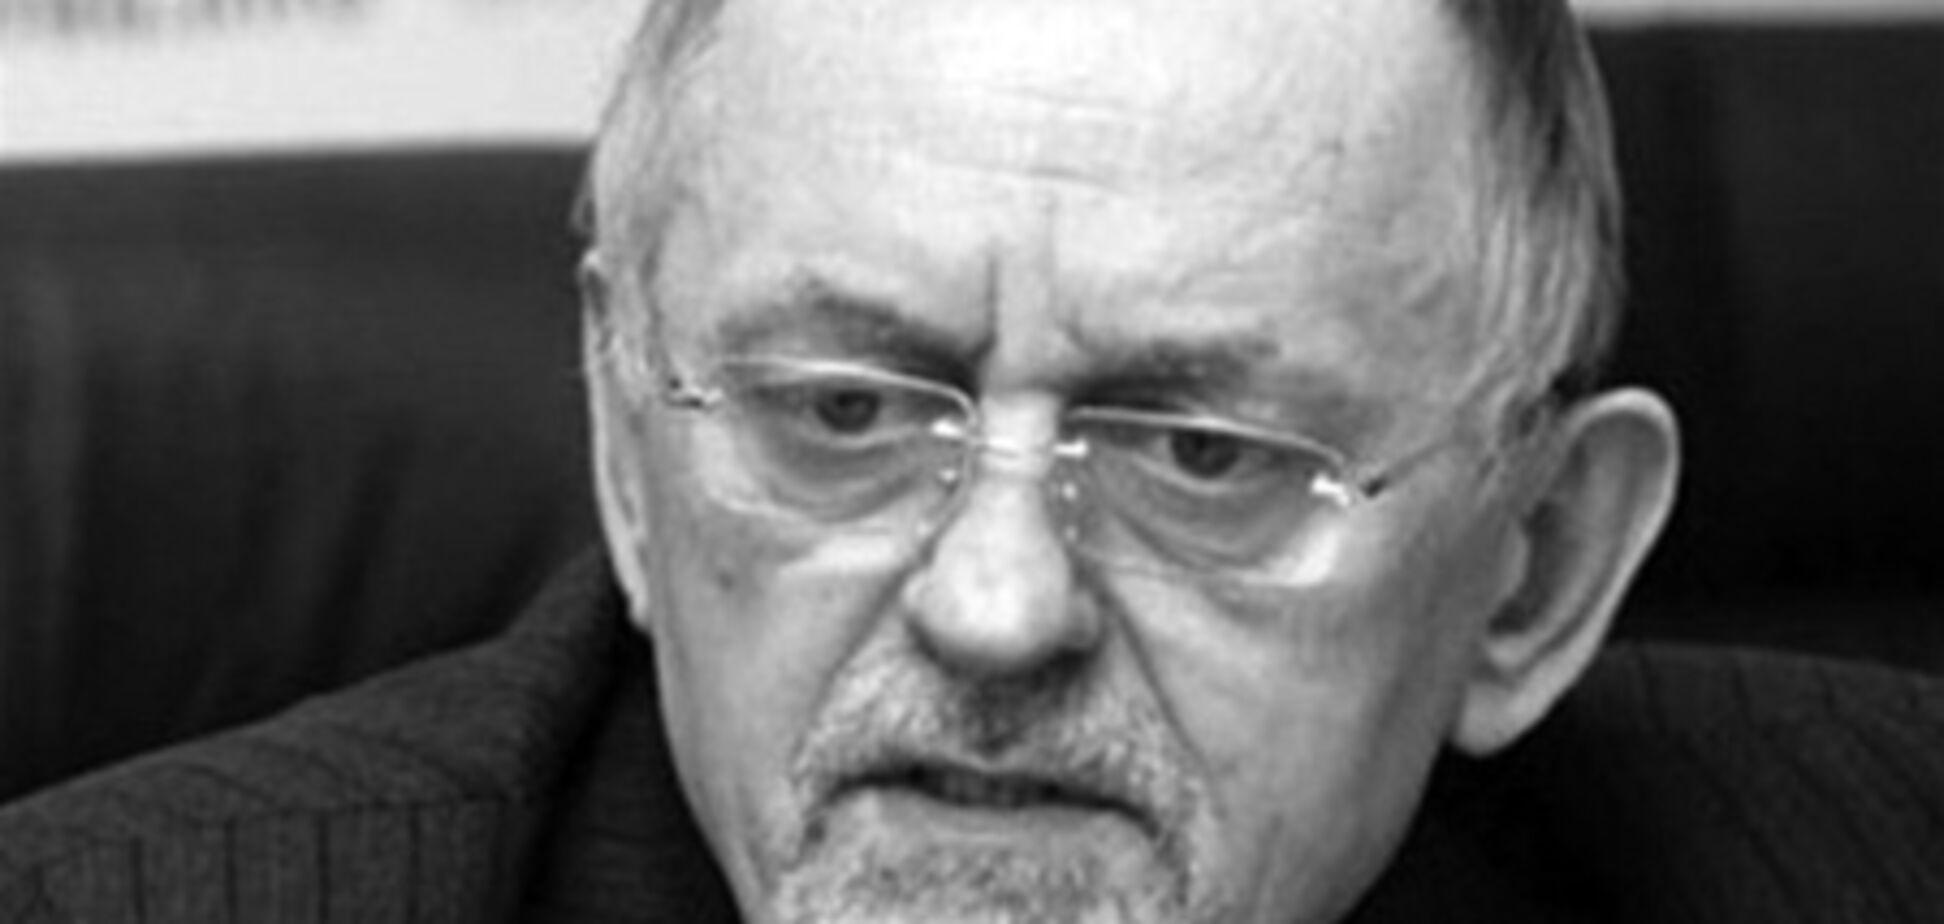 Умер депутат от БЮТ Владимир Полохало